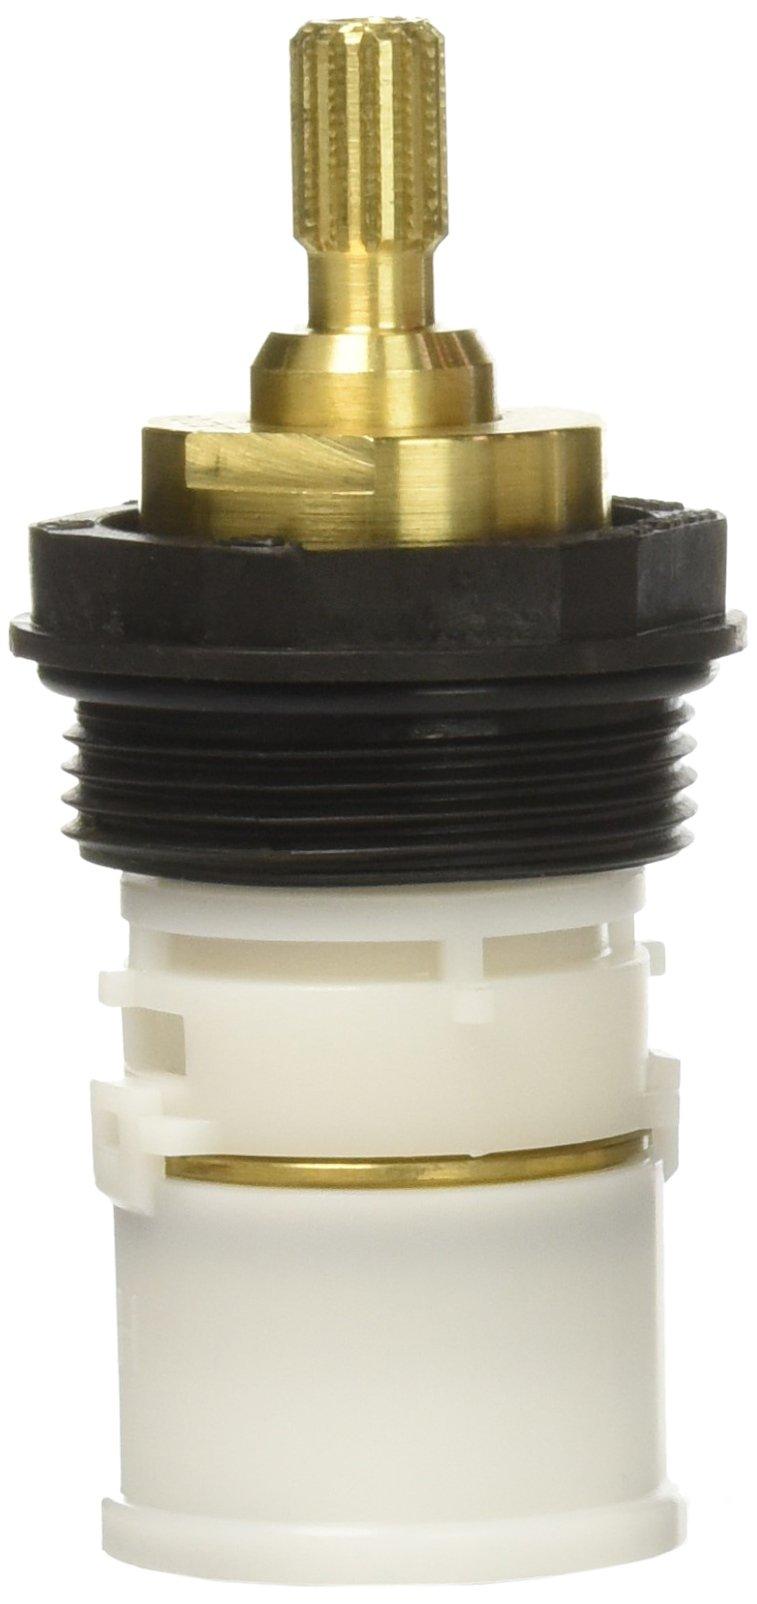 Powers 220-060 Cartridge Kit